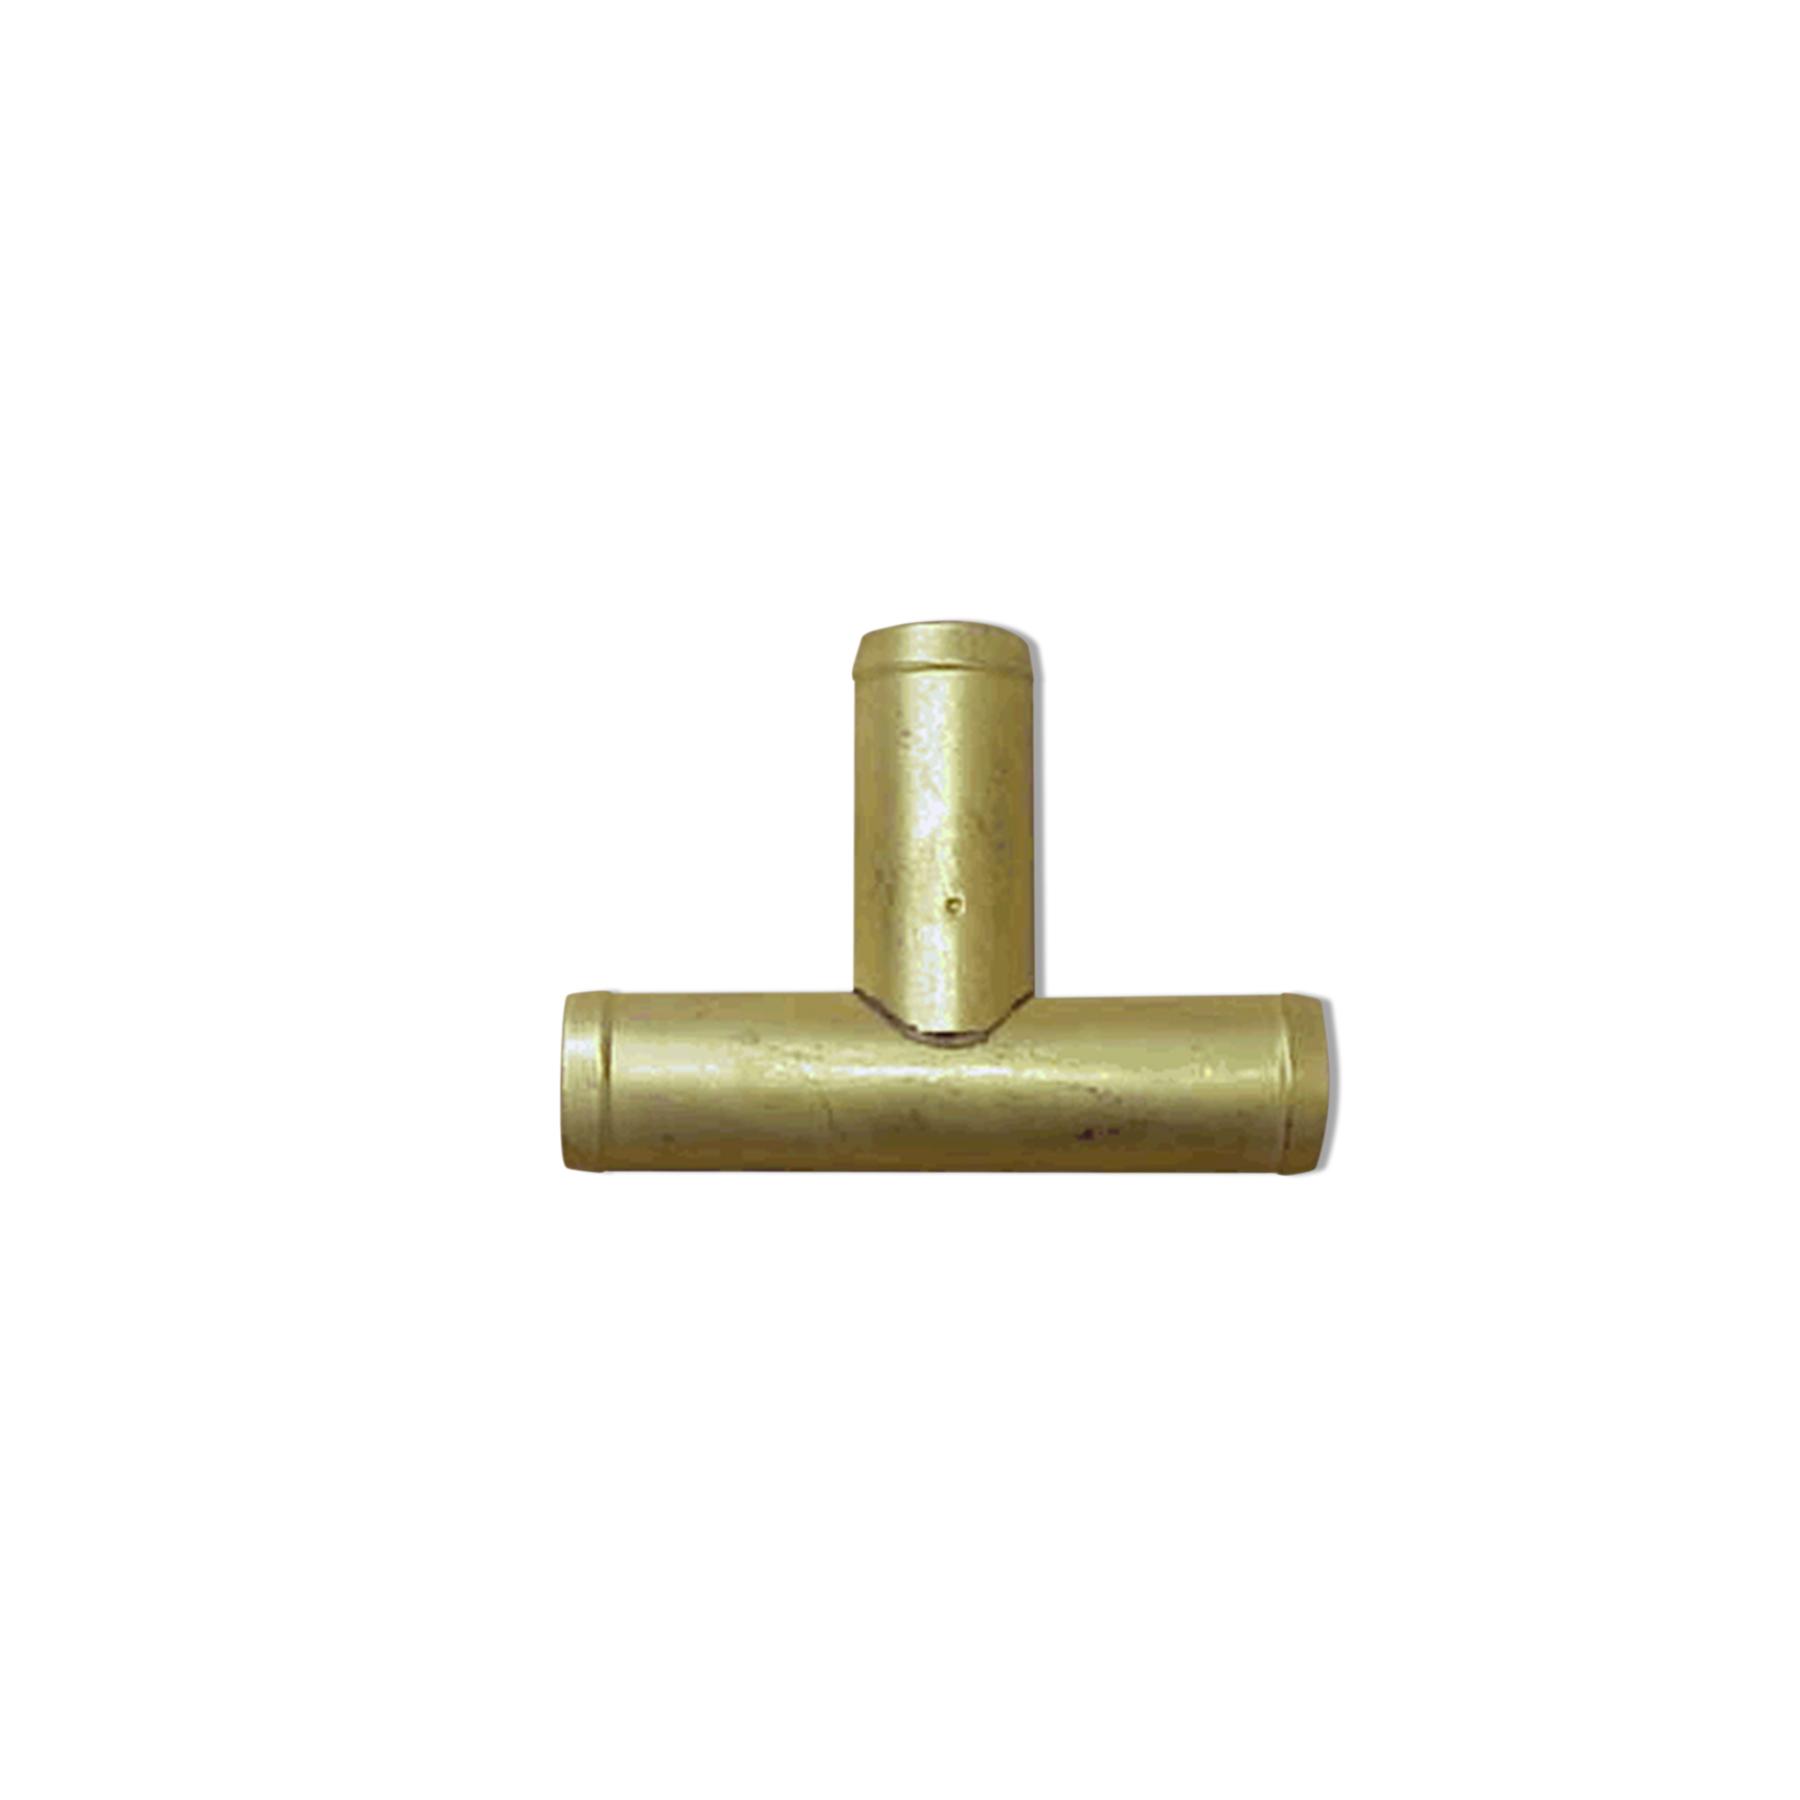 Brass Tee Fitting, O.D. 18 mm x 18 mm x 18 mm